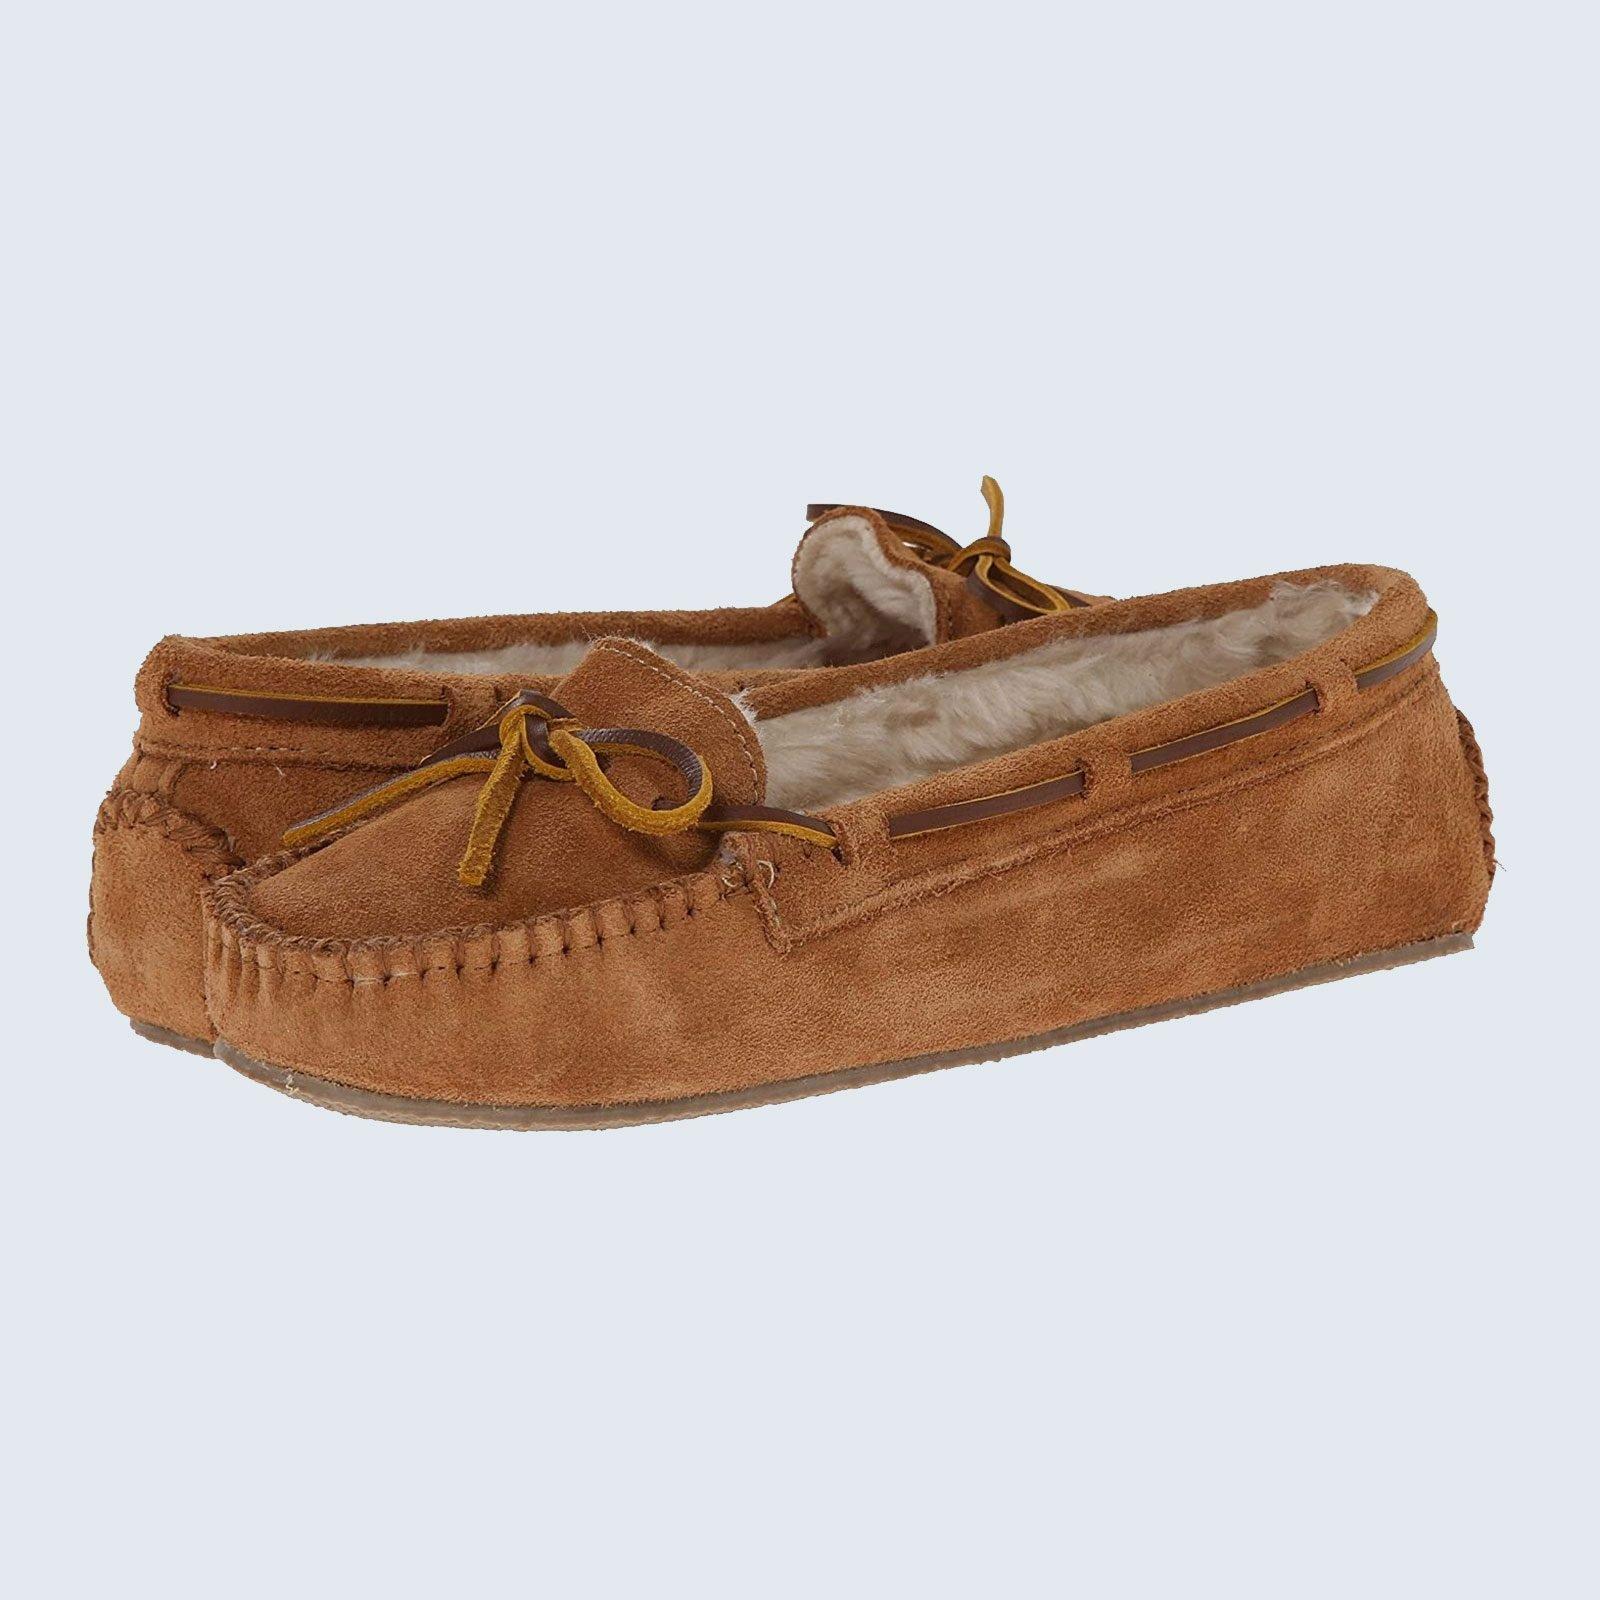 Best all-around slippers: Minnetonka Cally Slipper